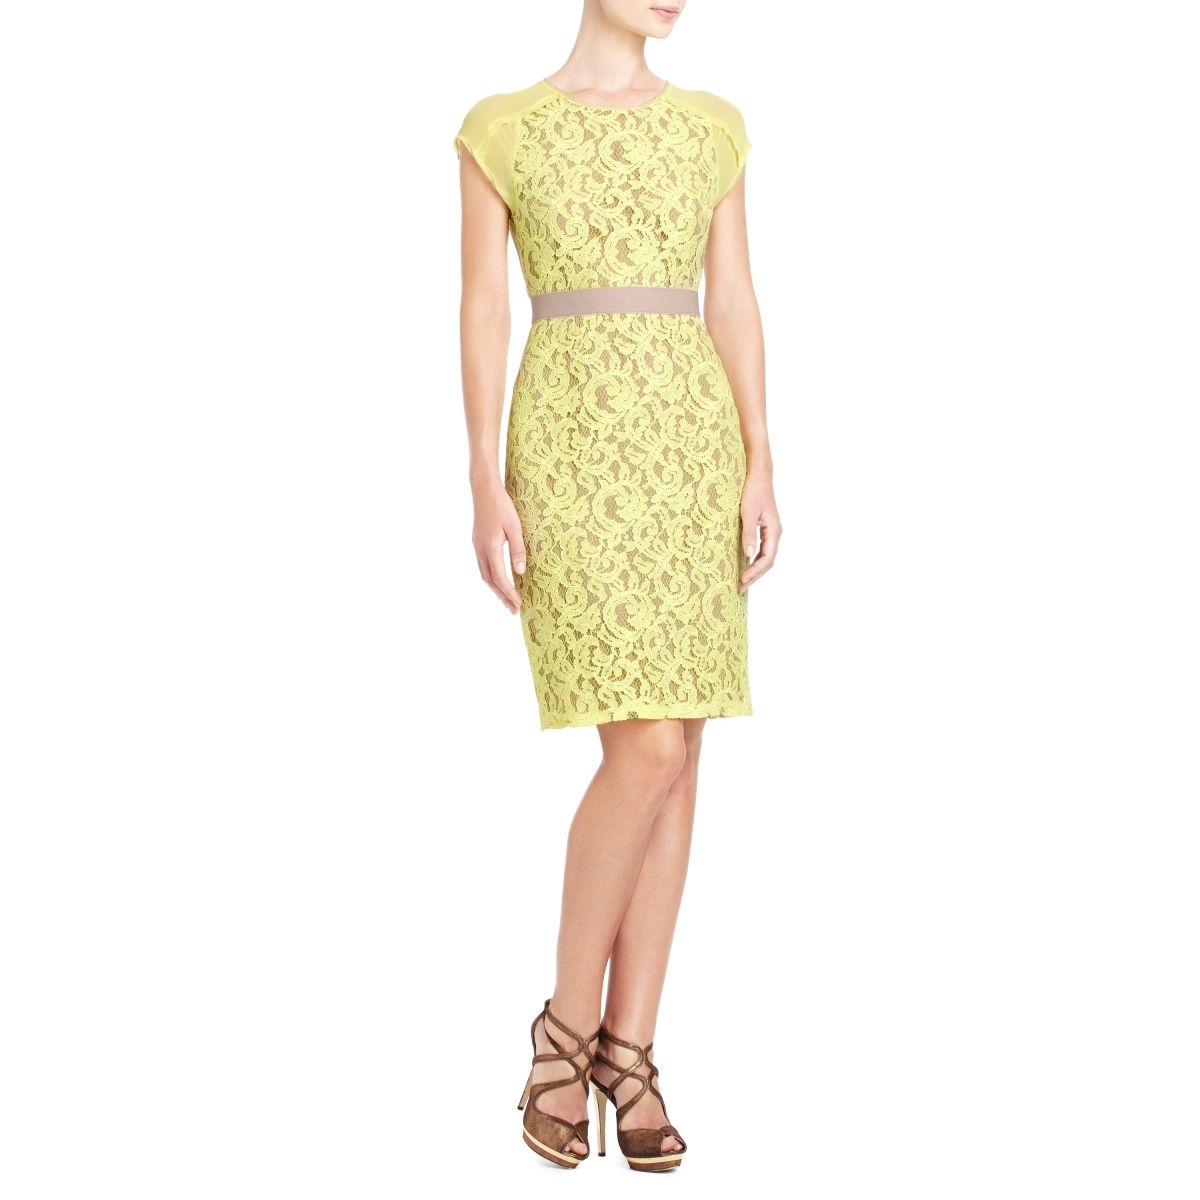 26e9213e50 BCBGMAXAZRIA - SHOP BY CATEGORY  DRESSES  VIEW ALL  CHARA LACE DRESS ...